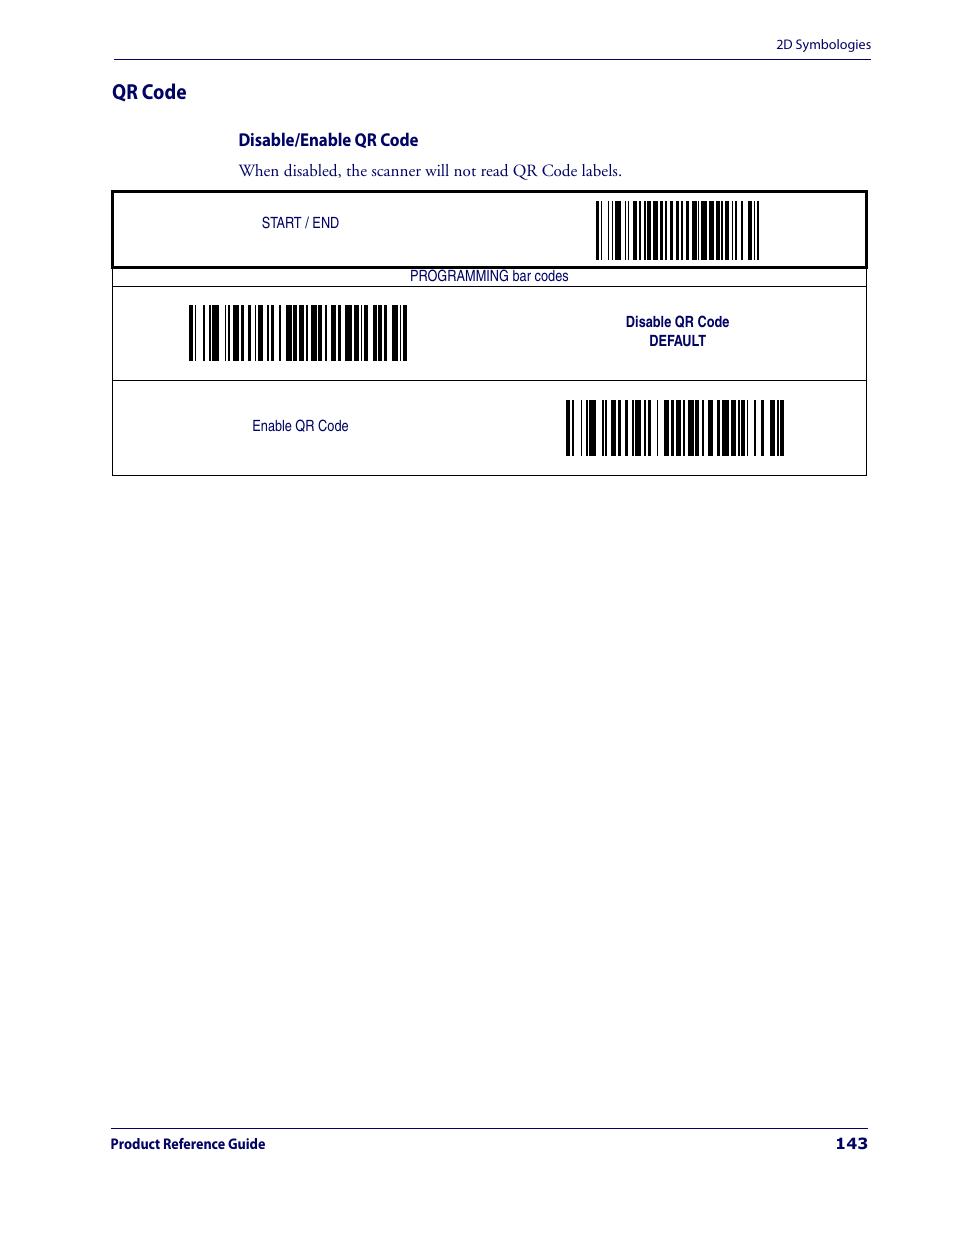 Qr code, Disable/enable qr code | Datalogic Scanning MAGELLAN 3200VSI User  Manual | Page 151 / 200